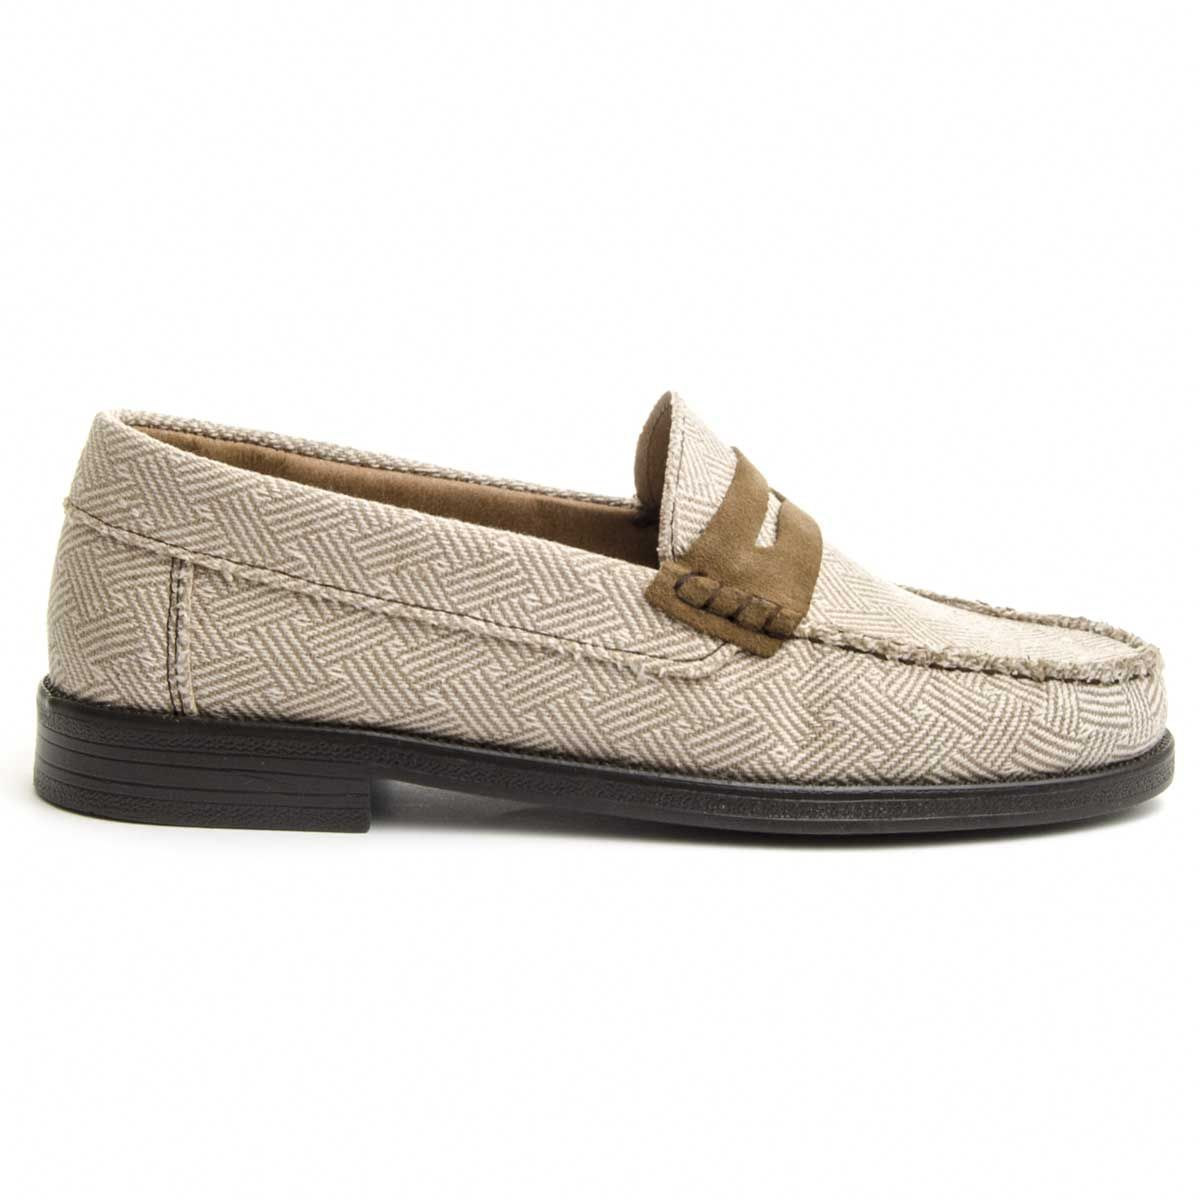 Montevita Comfortable Loafer in Brown